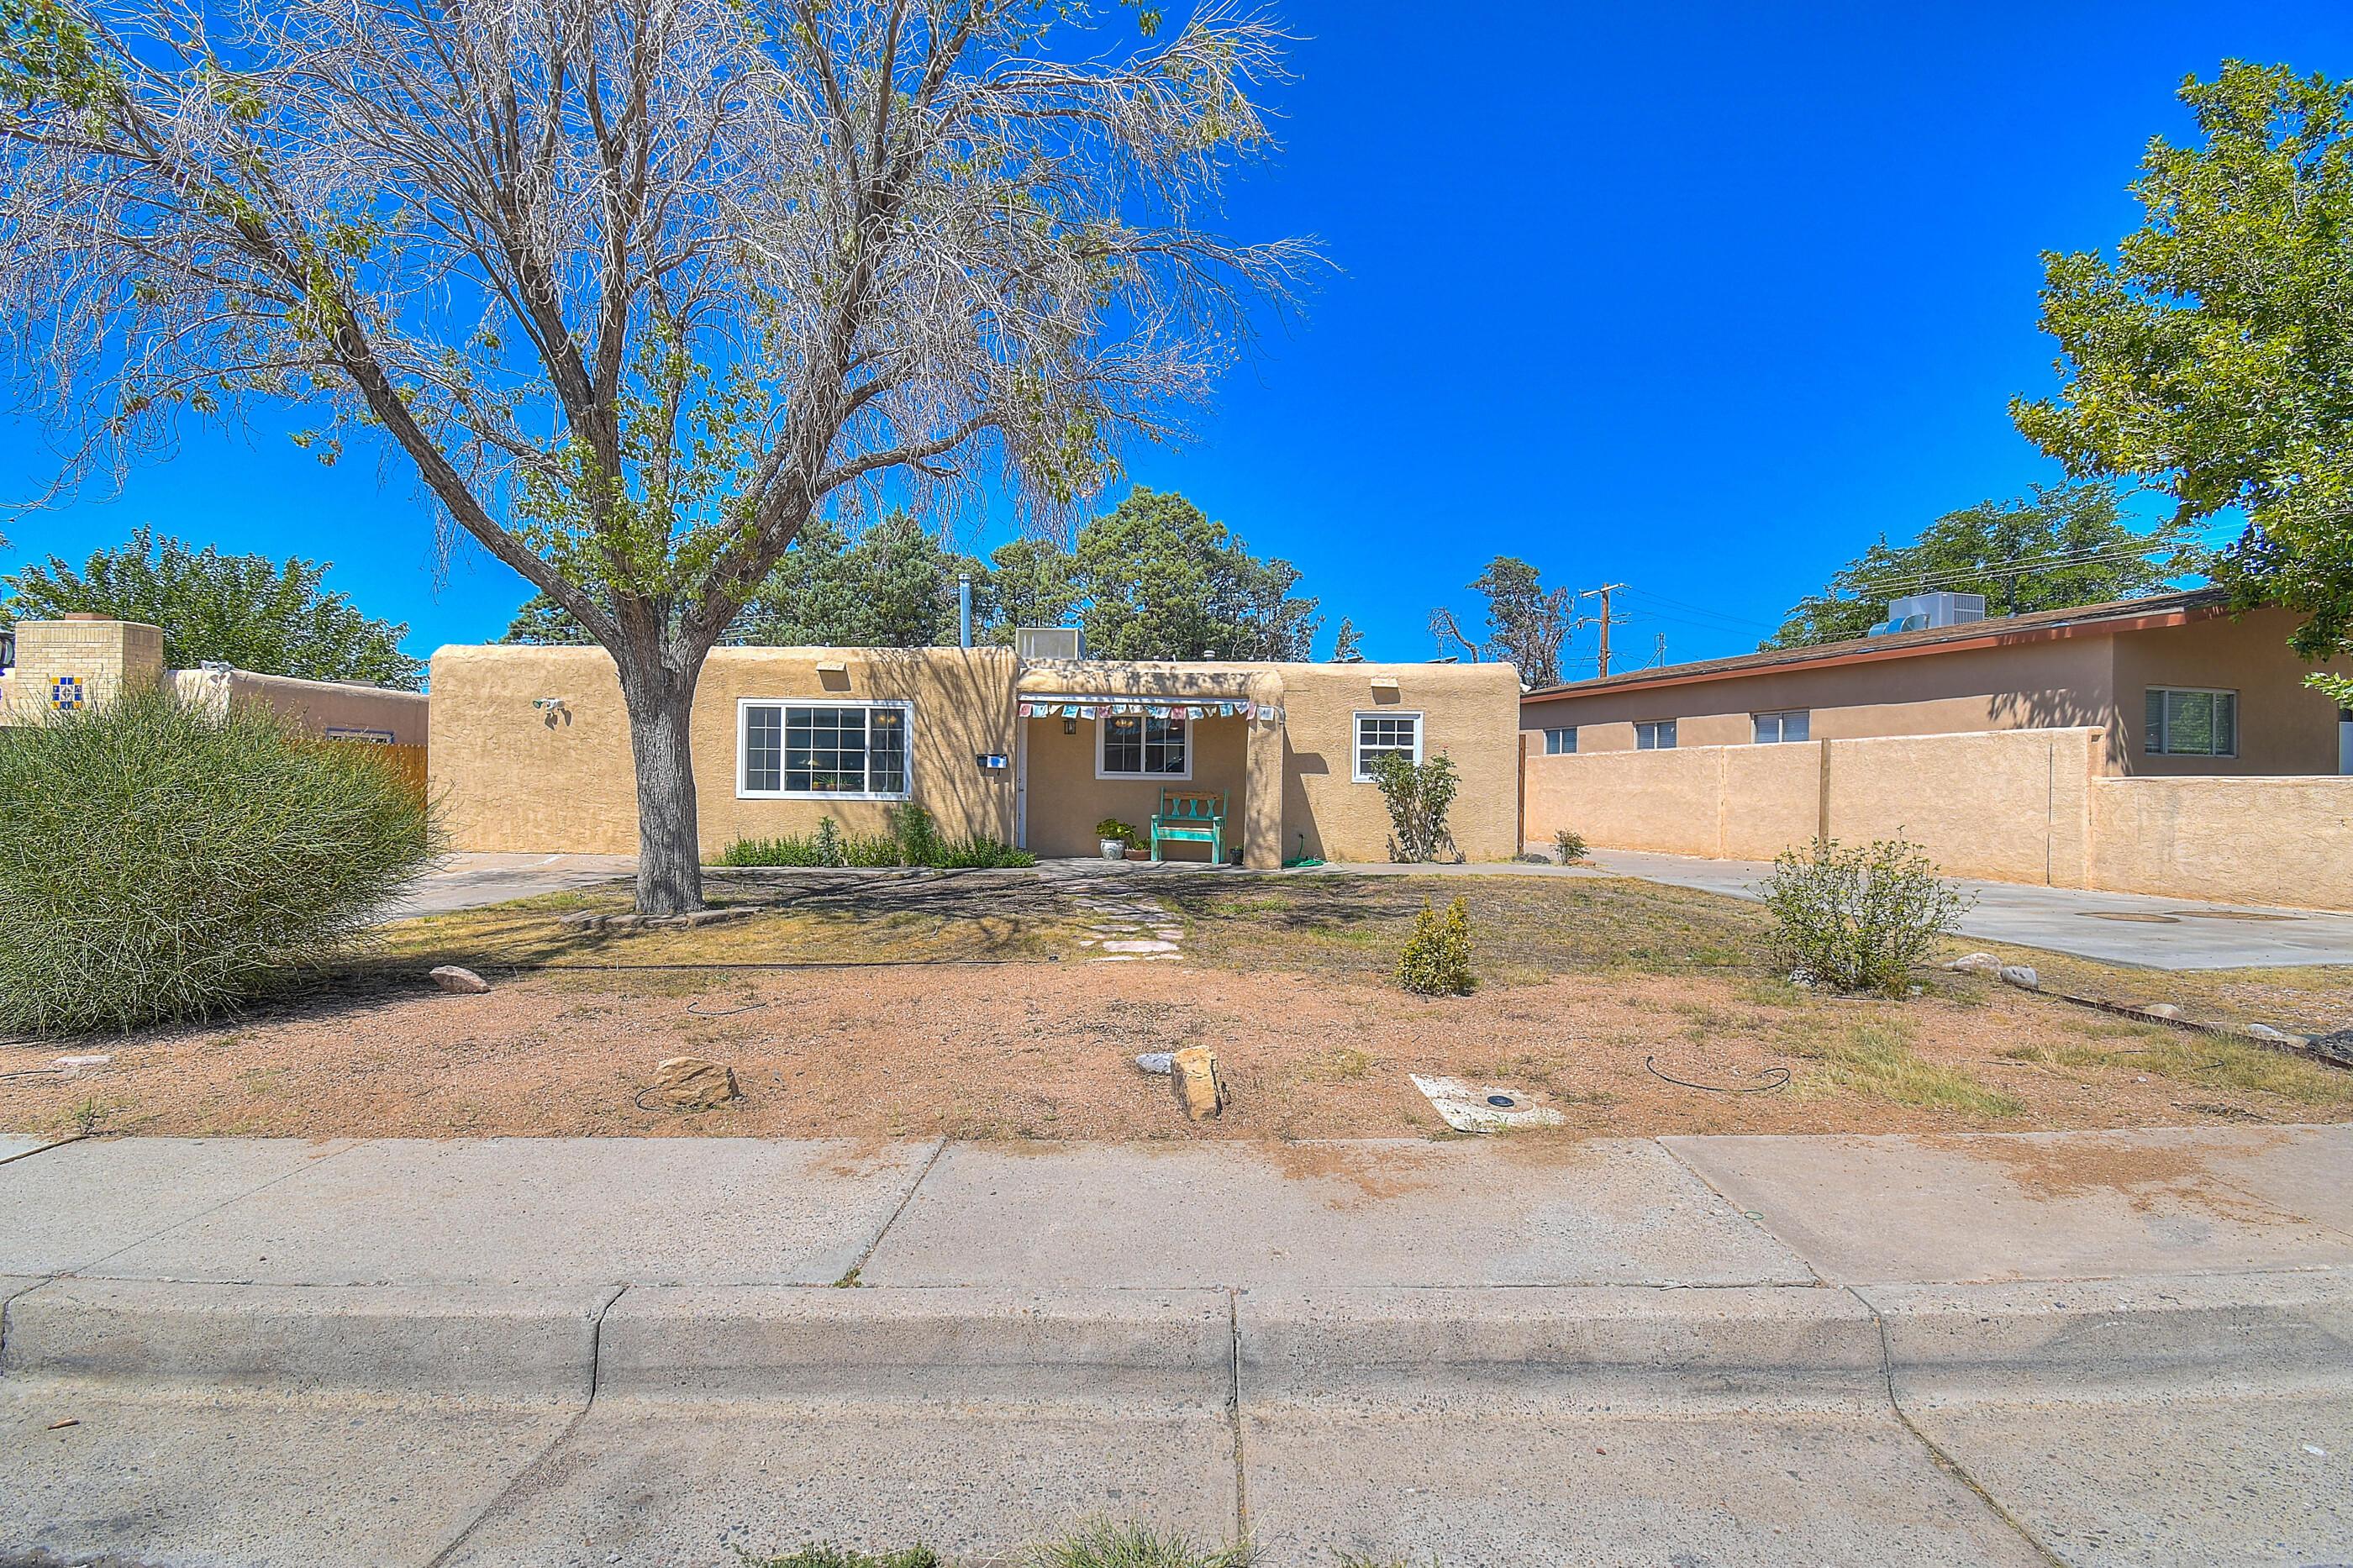 1215 CHRISTINE Street, Albuquerque NM 87112